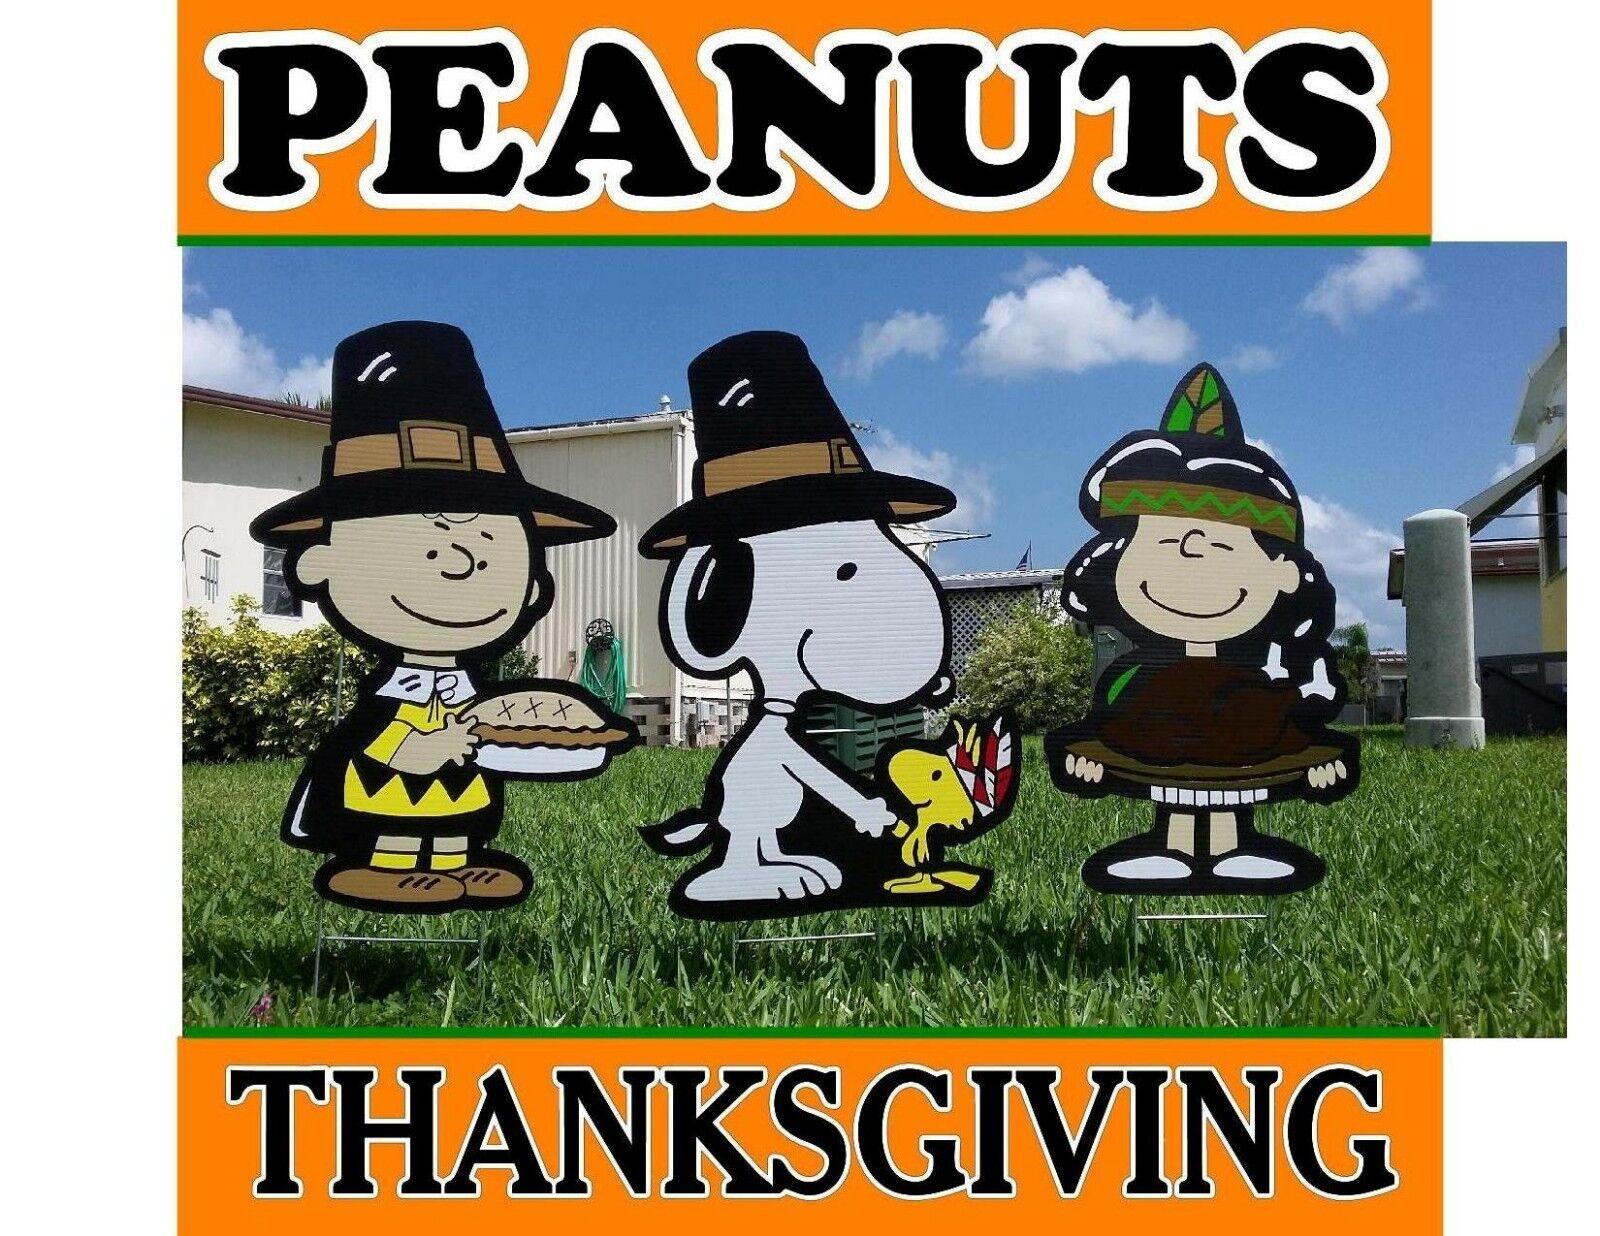 Peanuts Charlie braun Thanksgiving  Decorations